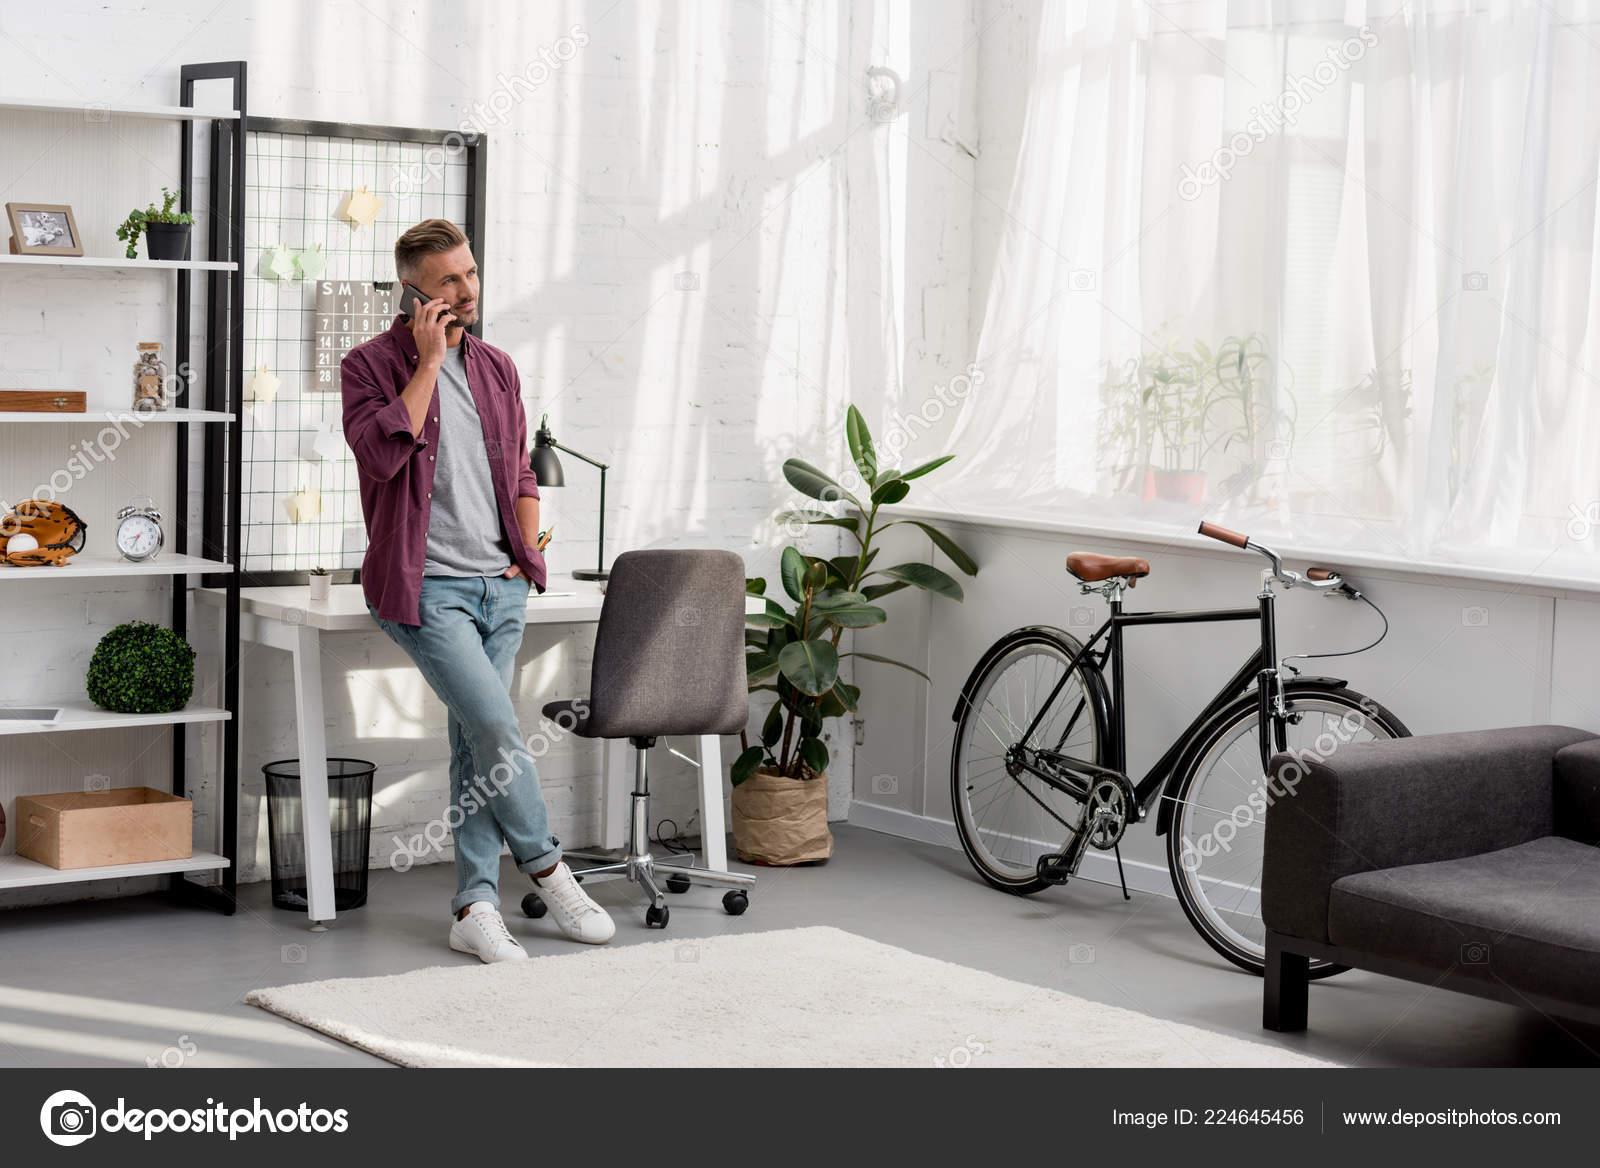 Mann Spricht Telefon Hause Buro Stockfoto C Andrewlozovyi 224645456